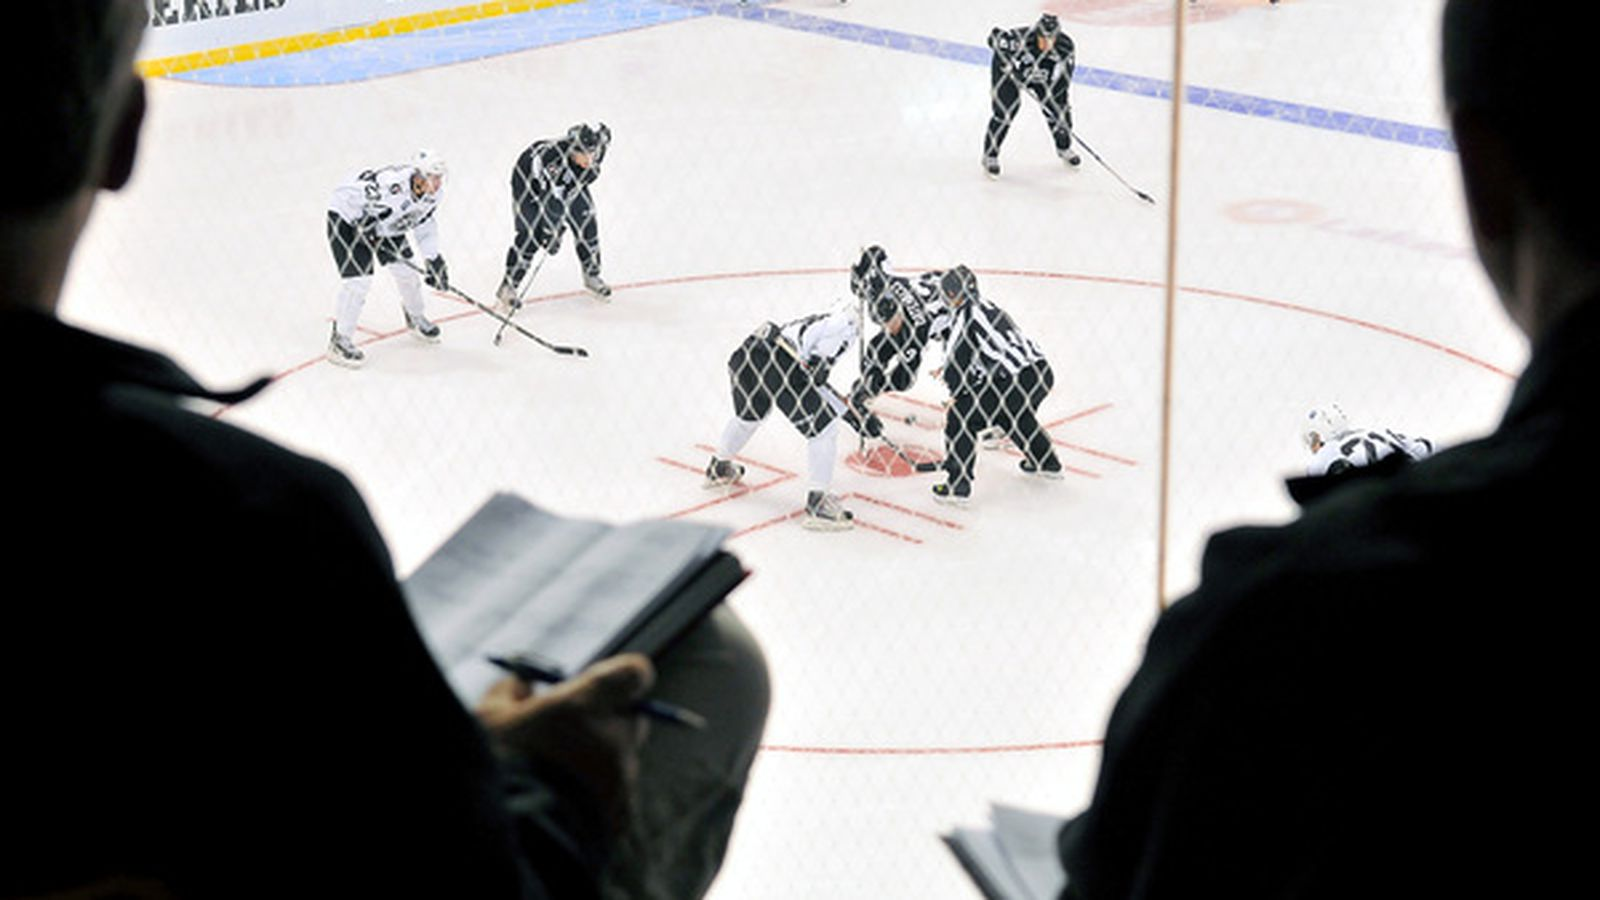 NHL规则的变化:引回红线将是反动的,而不是聪明的